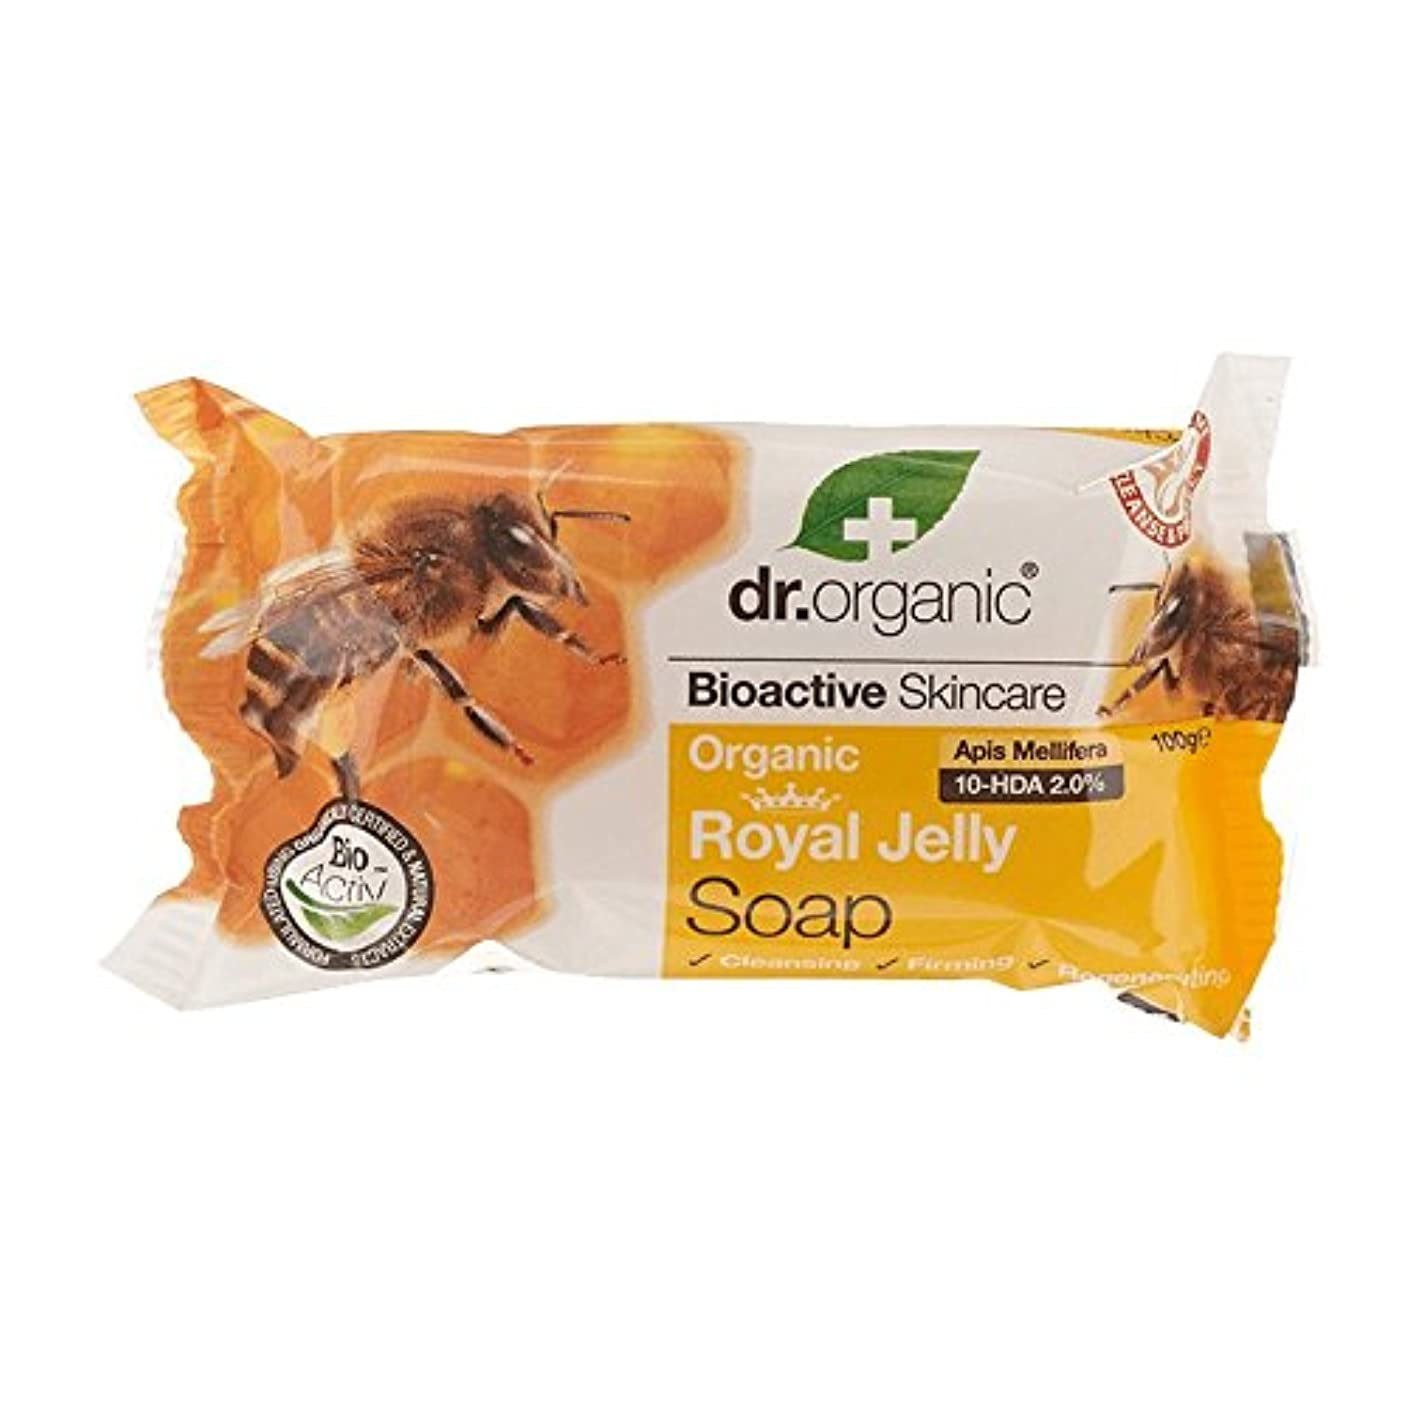 Dr Organic Royal Jelly Soap (Pack of 6) - Dr有機ローヤルゼリーソープ (x6) [並行輸入品]